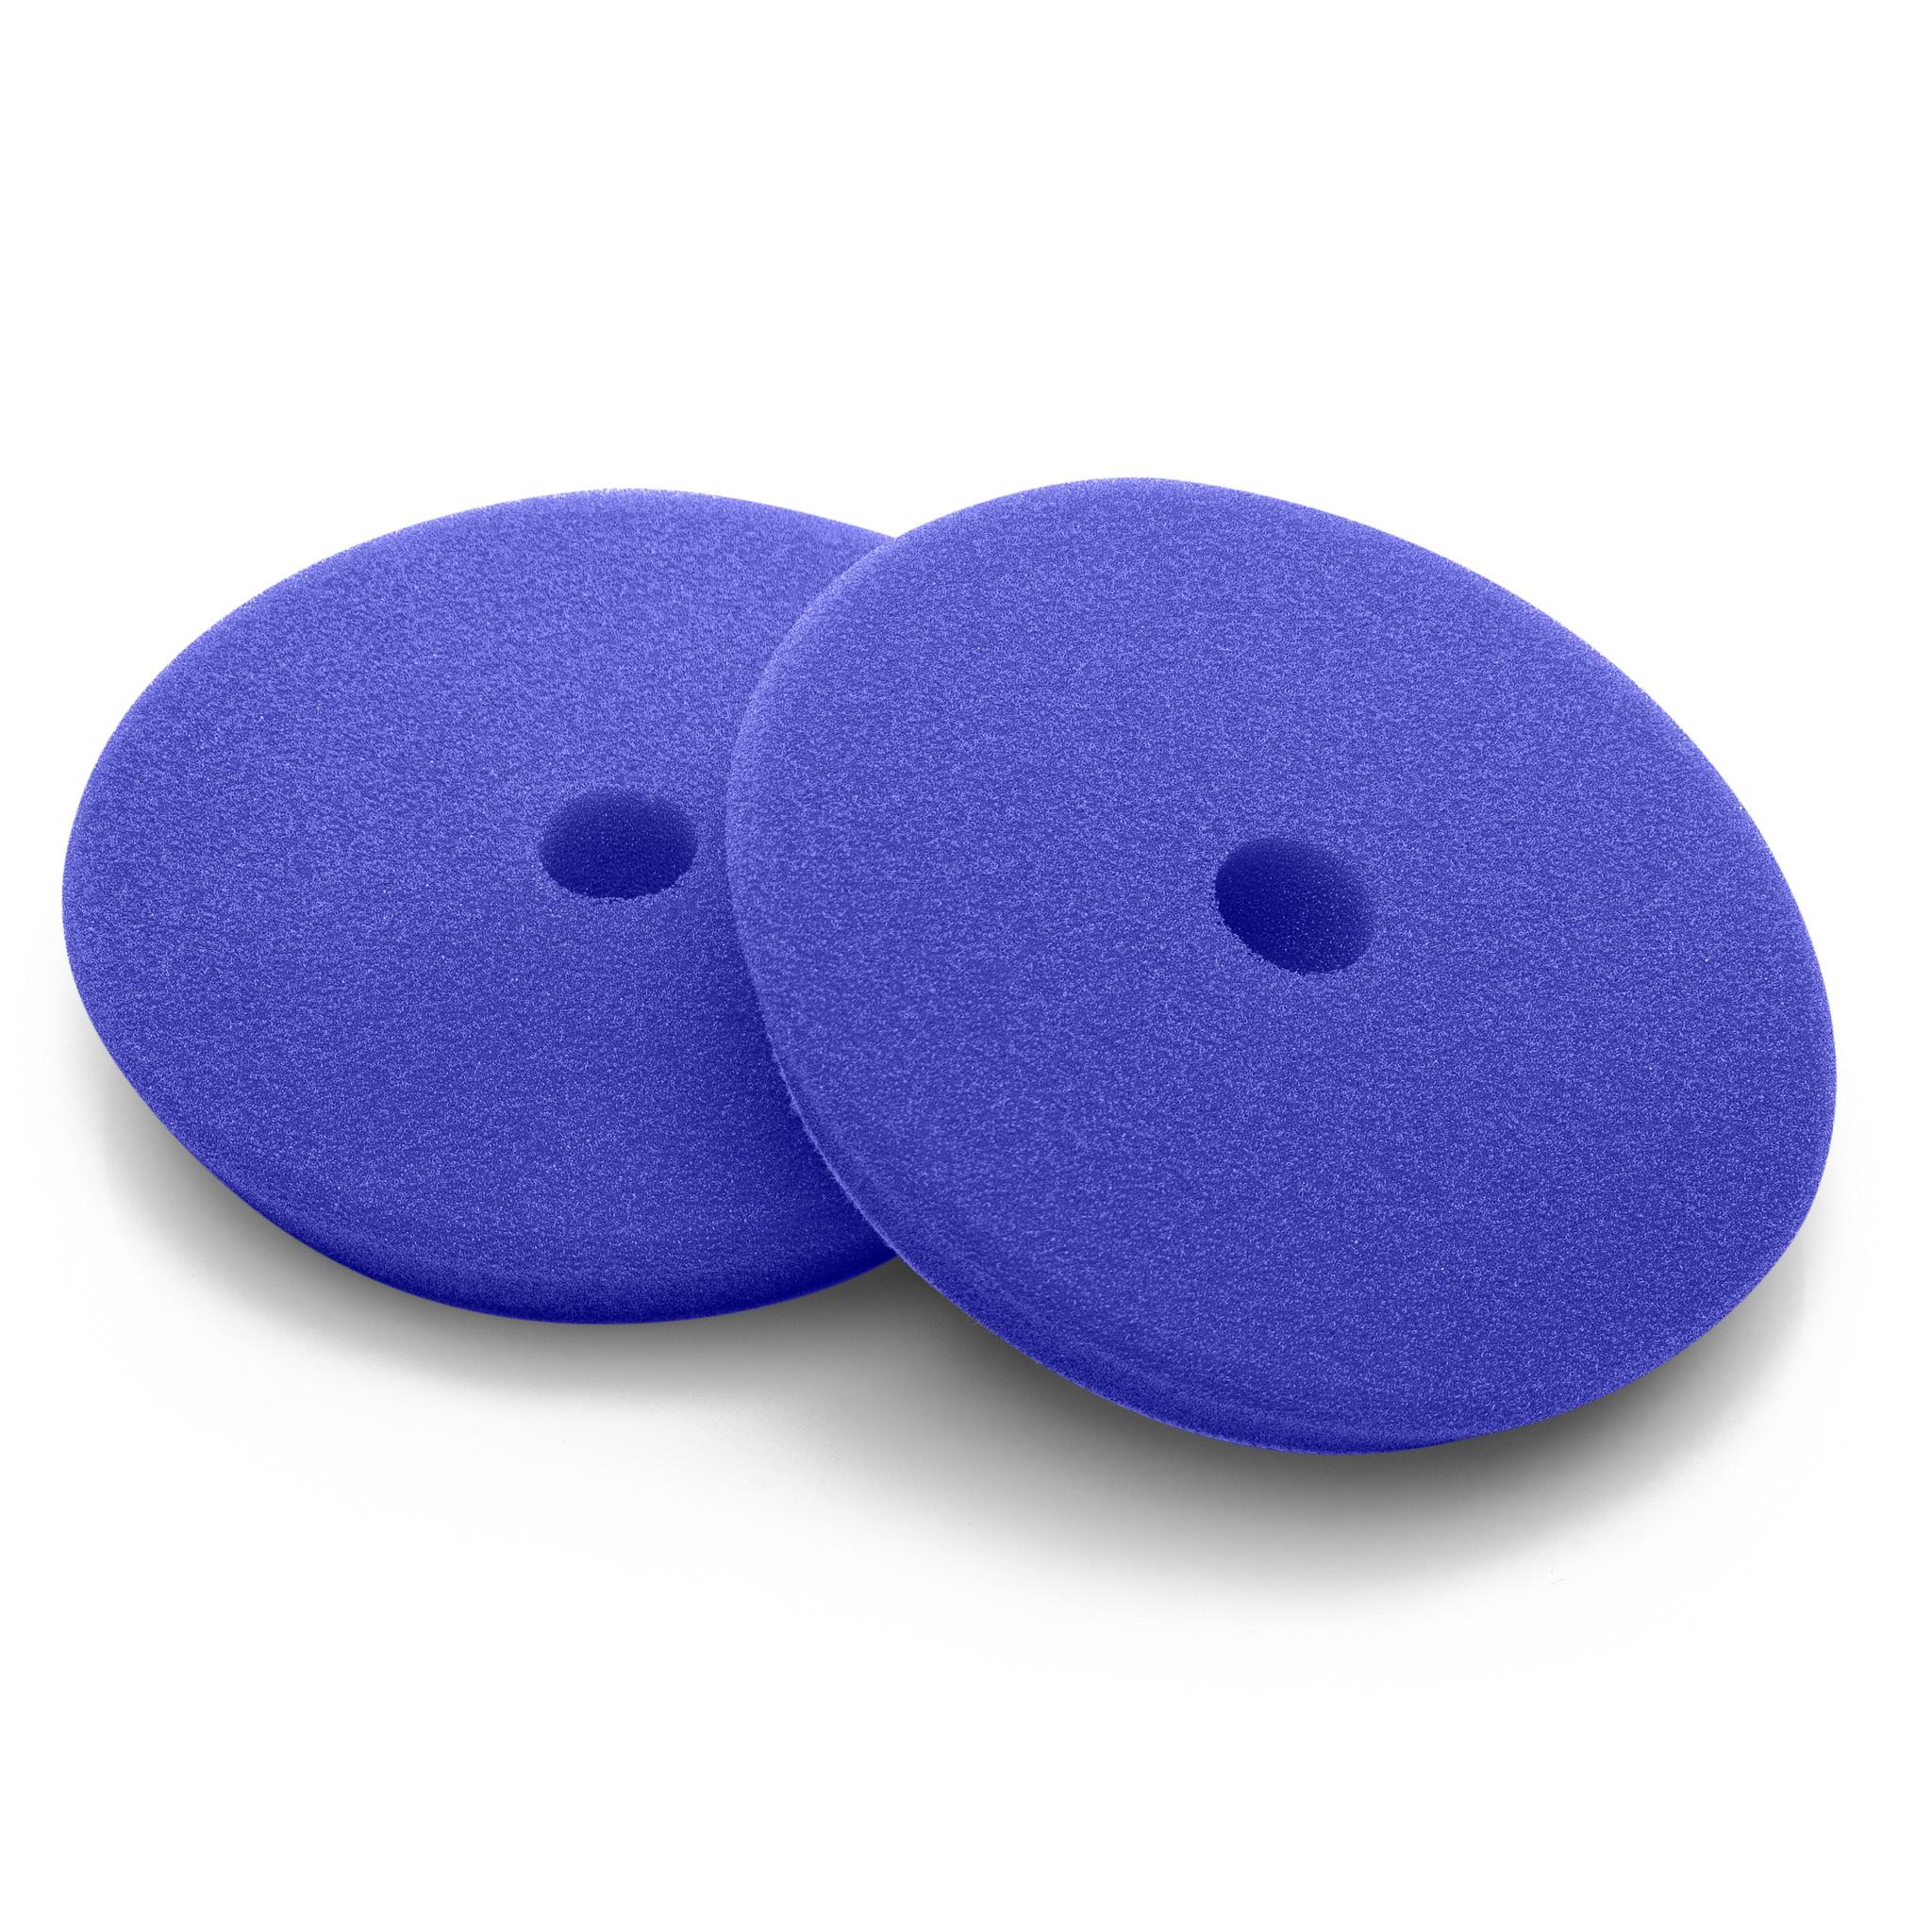 Ewocar Ewocar Hart Pad Blau 175mm